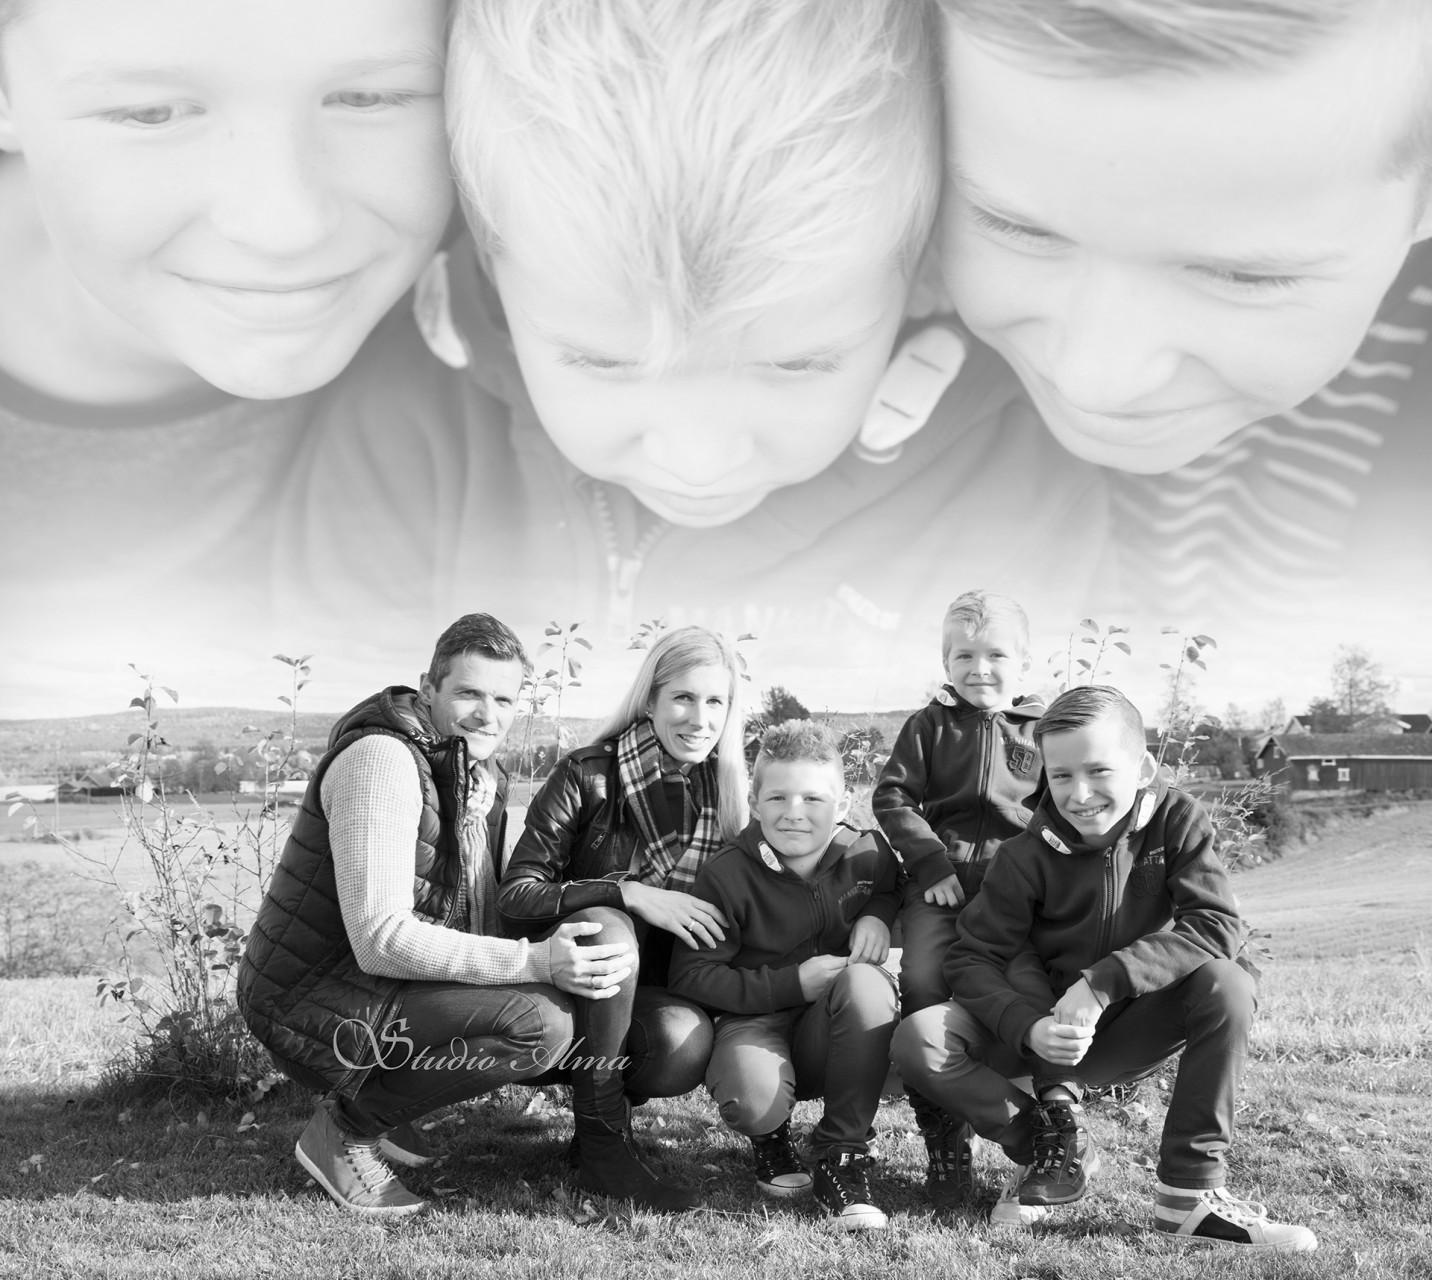 familie-studioalma-collage-sh